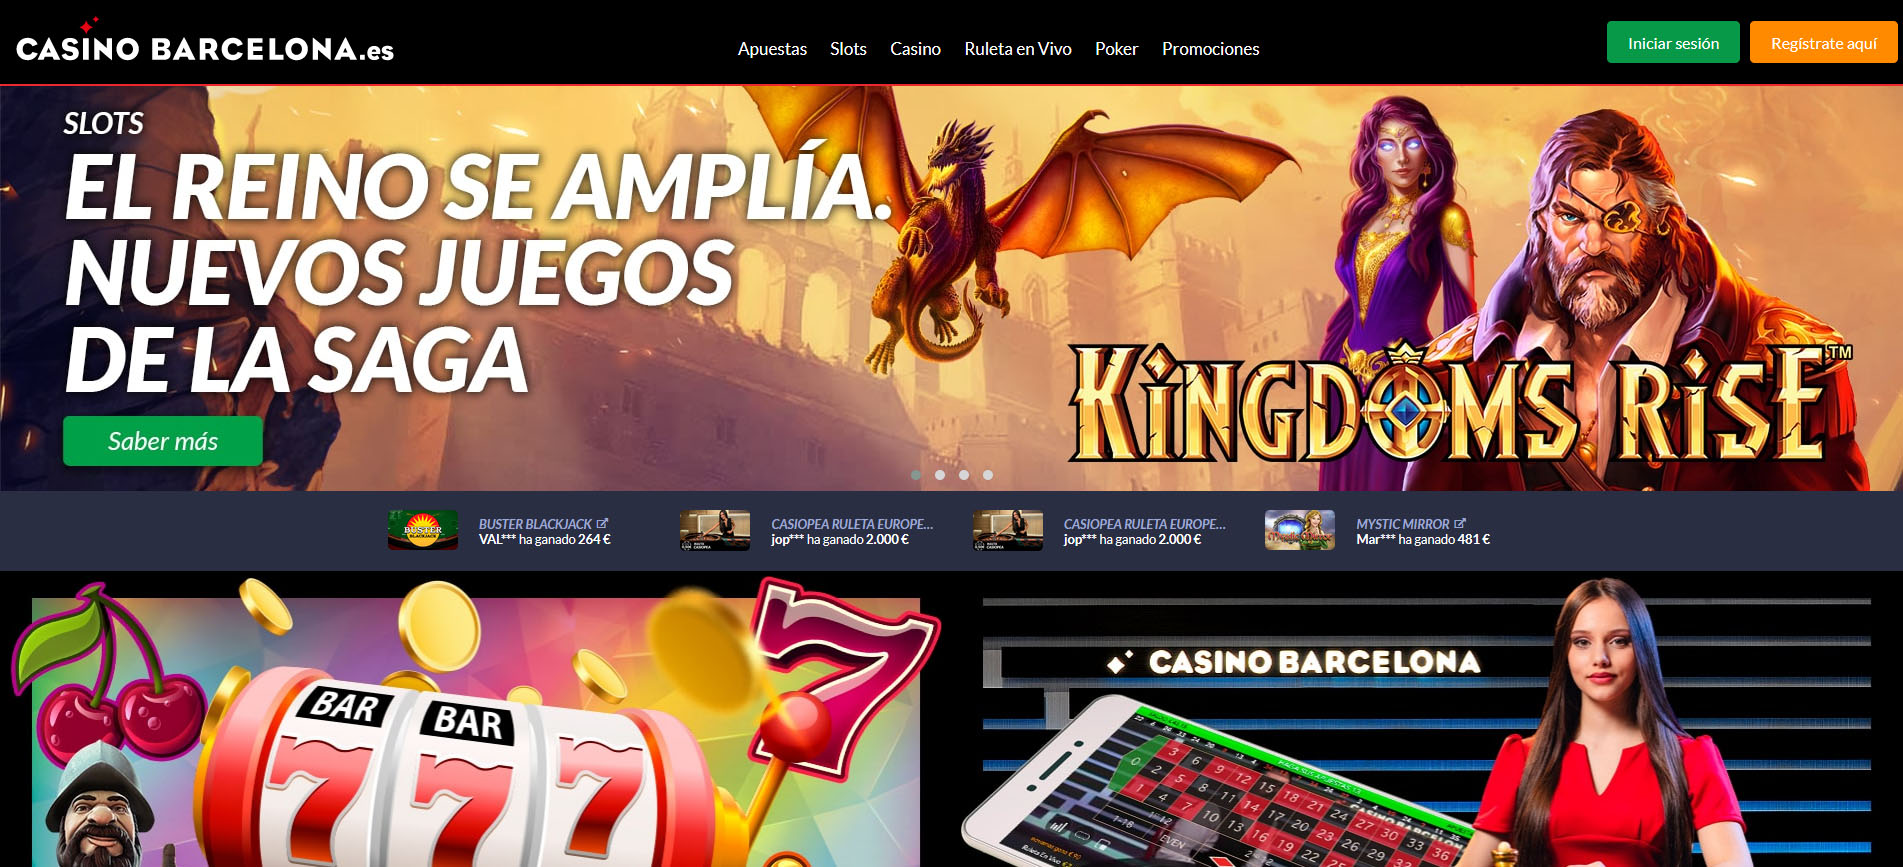 Casino Barcelona online HOME